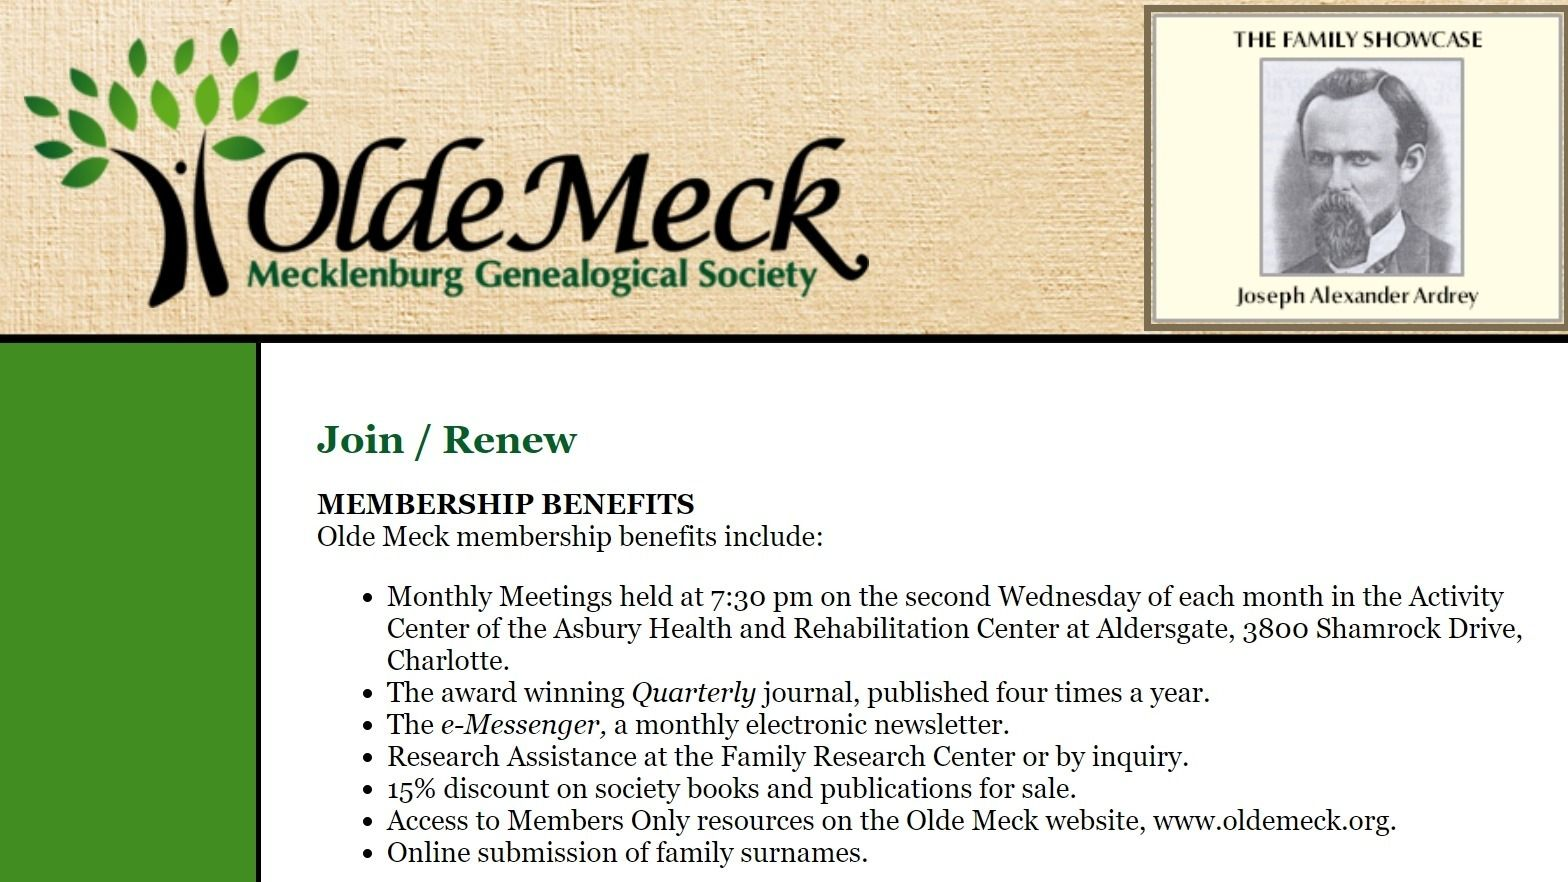 Olde Meck Genealogical Society Meetup